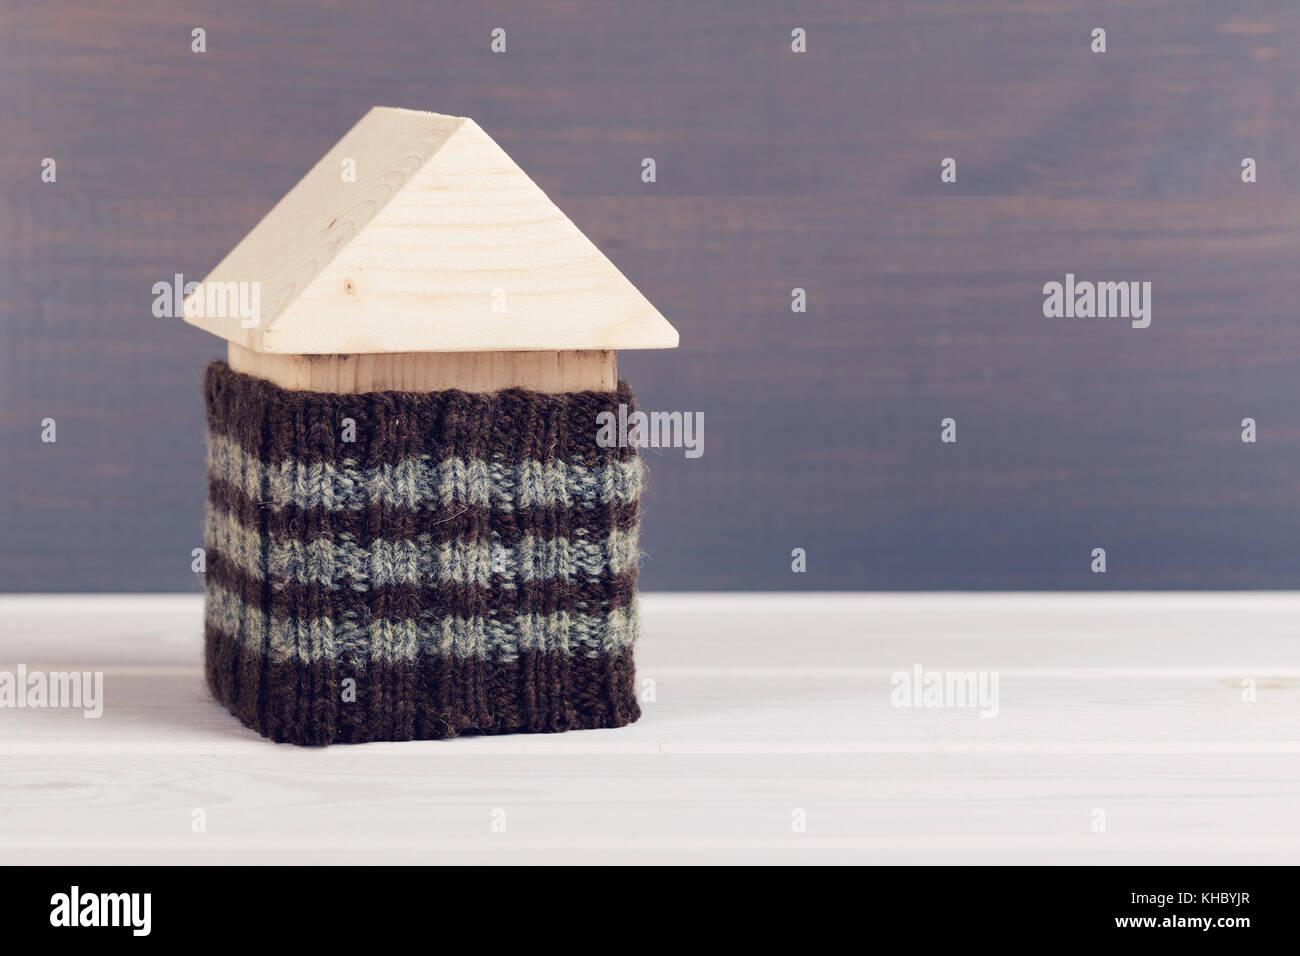 Energie effizient gedämmten Haus Konzept. Kopieren Sie Platz Stockbild